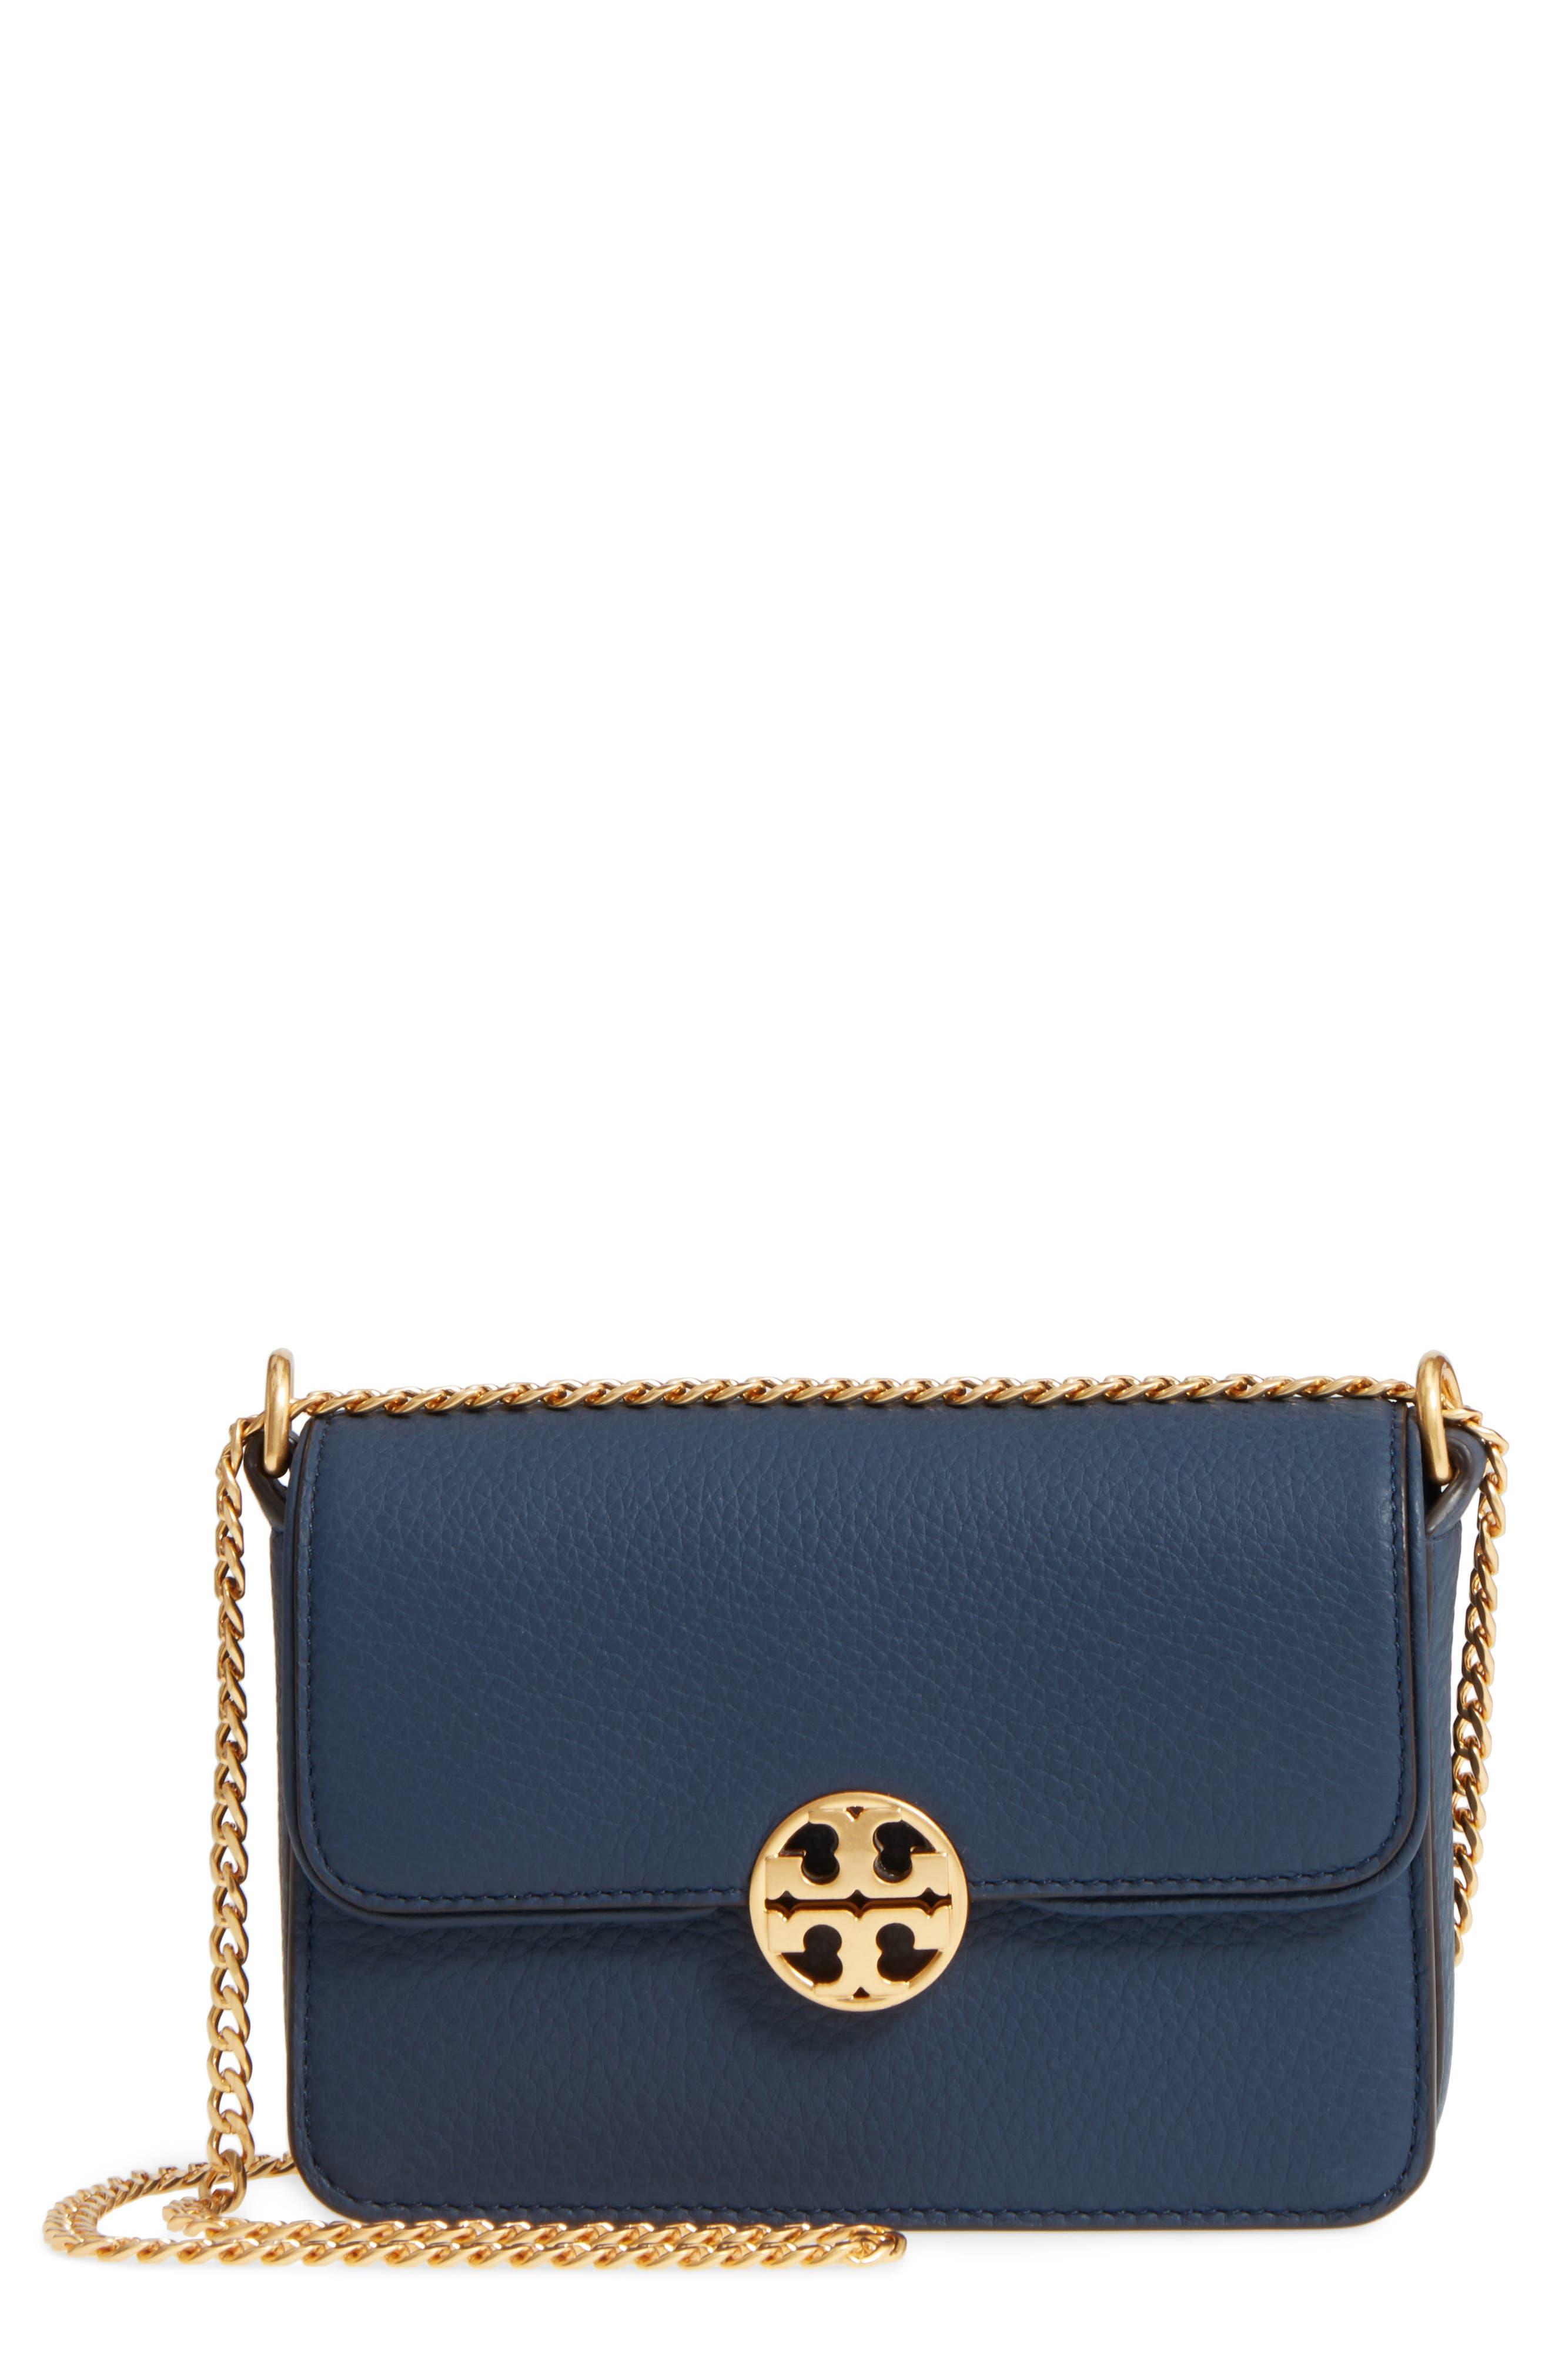 Mini Chelsea Leather Convertible Crossbody Bag,                             Main thumbnail 2, color,